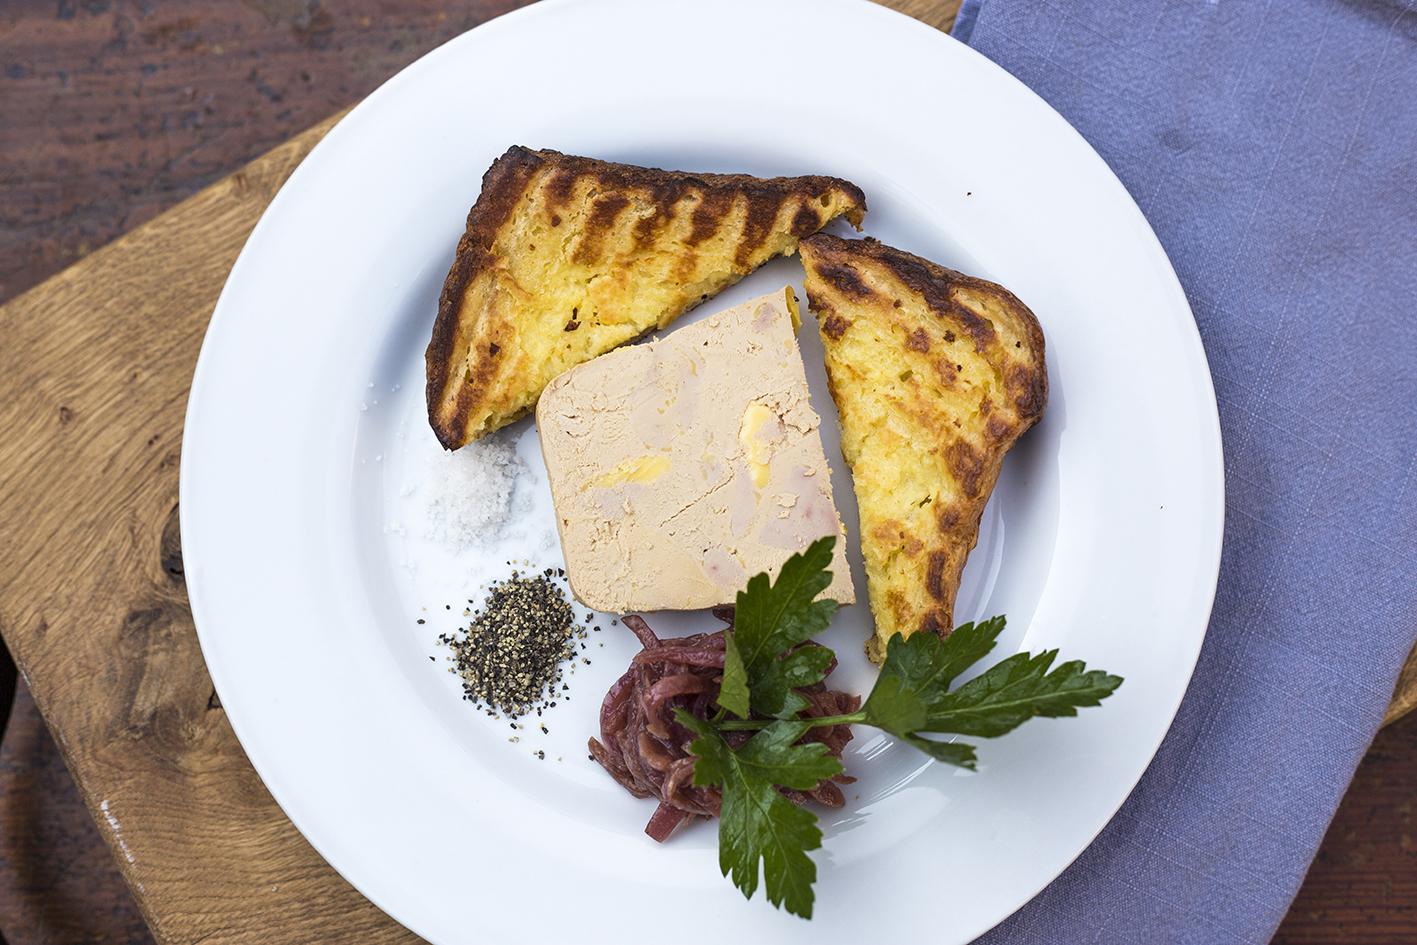 Foie gras de canard_1D7A4409